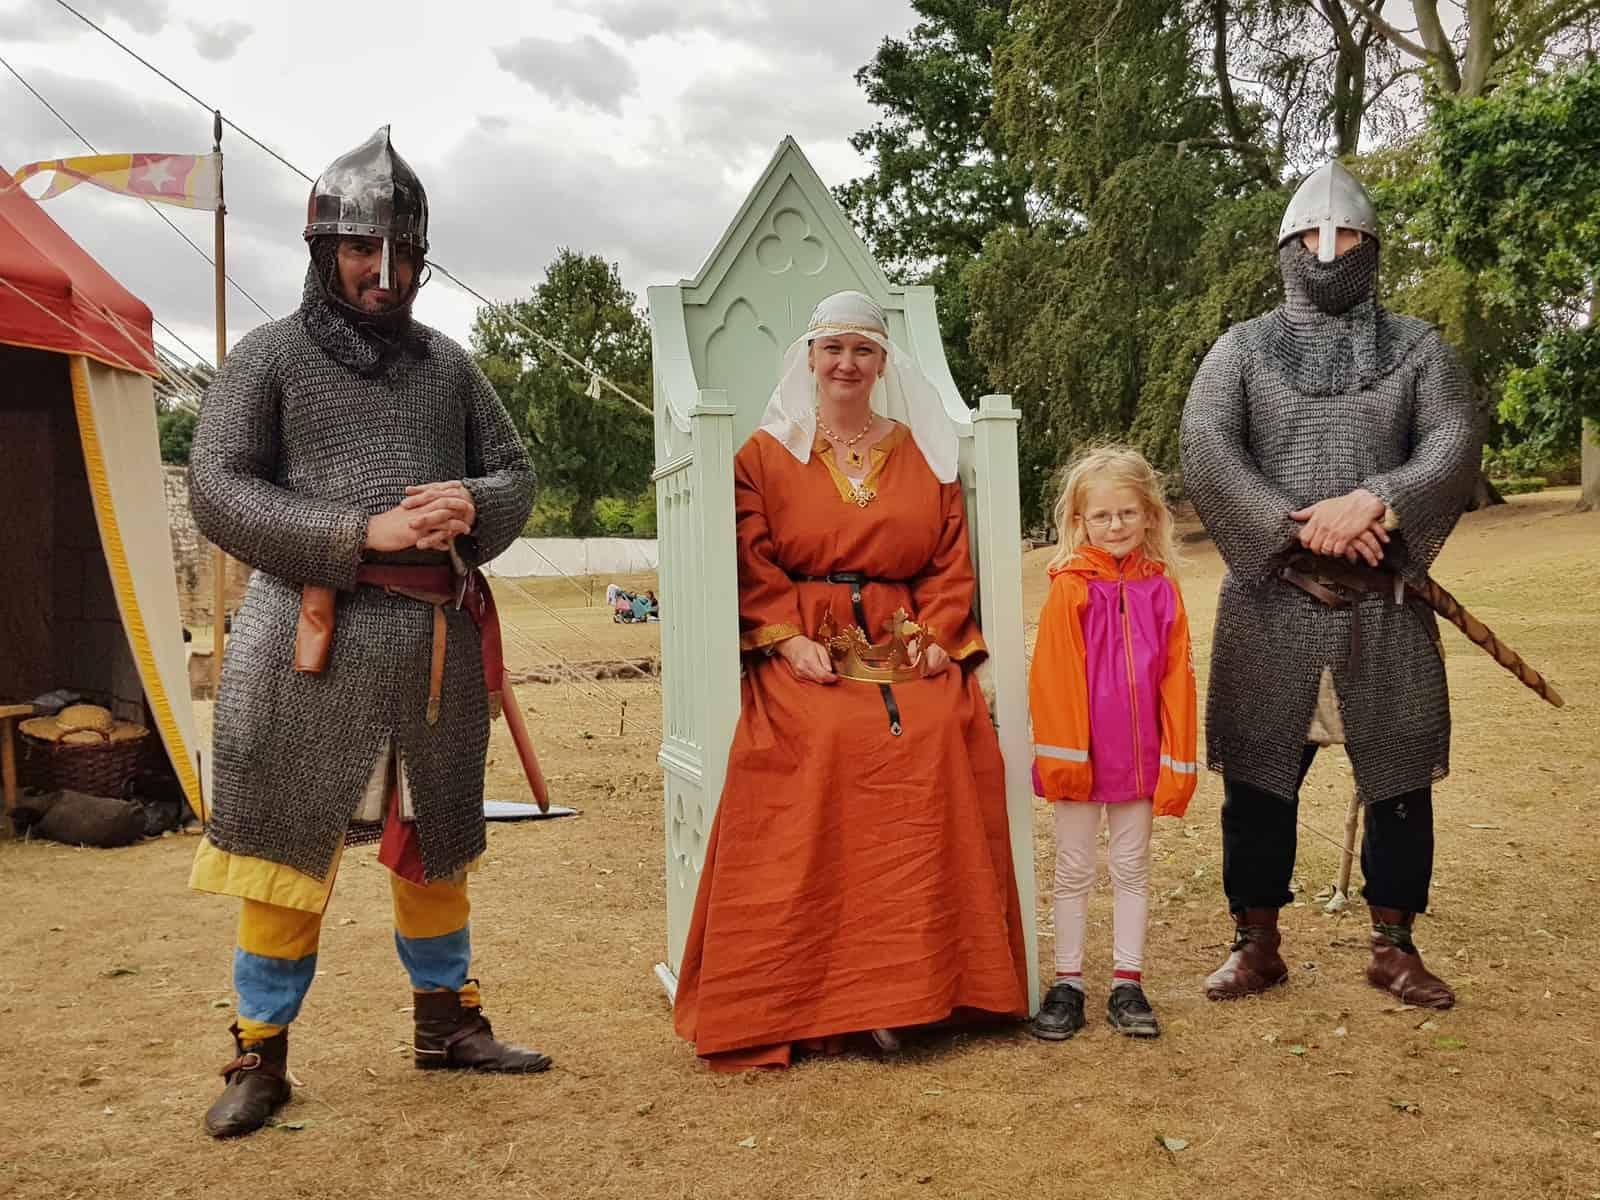 Kenilworth Castle Warwickshire Empress Matilda and knights at Norman Castle event